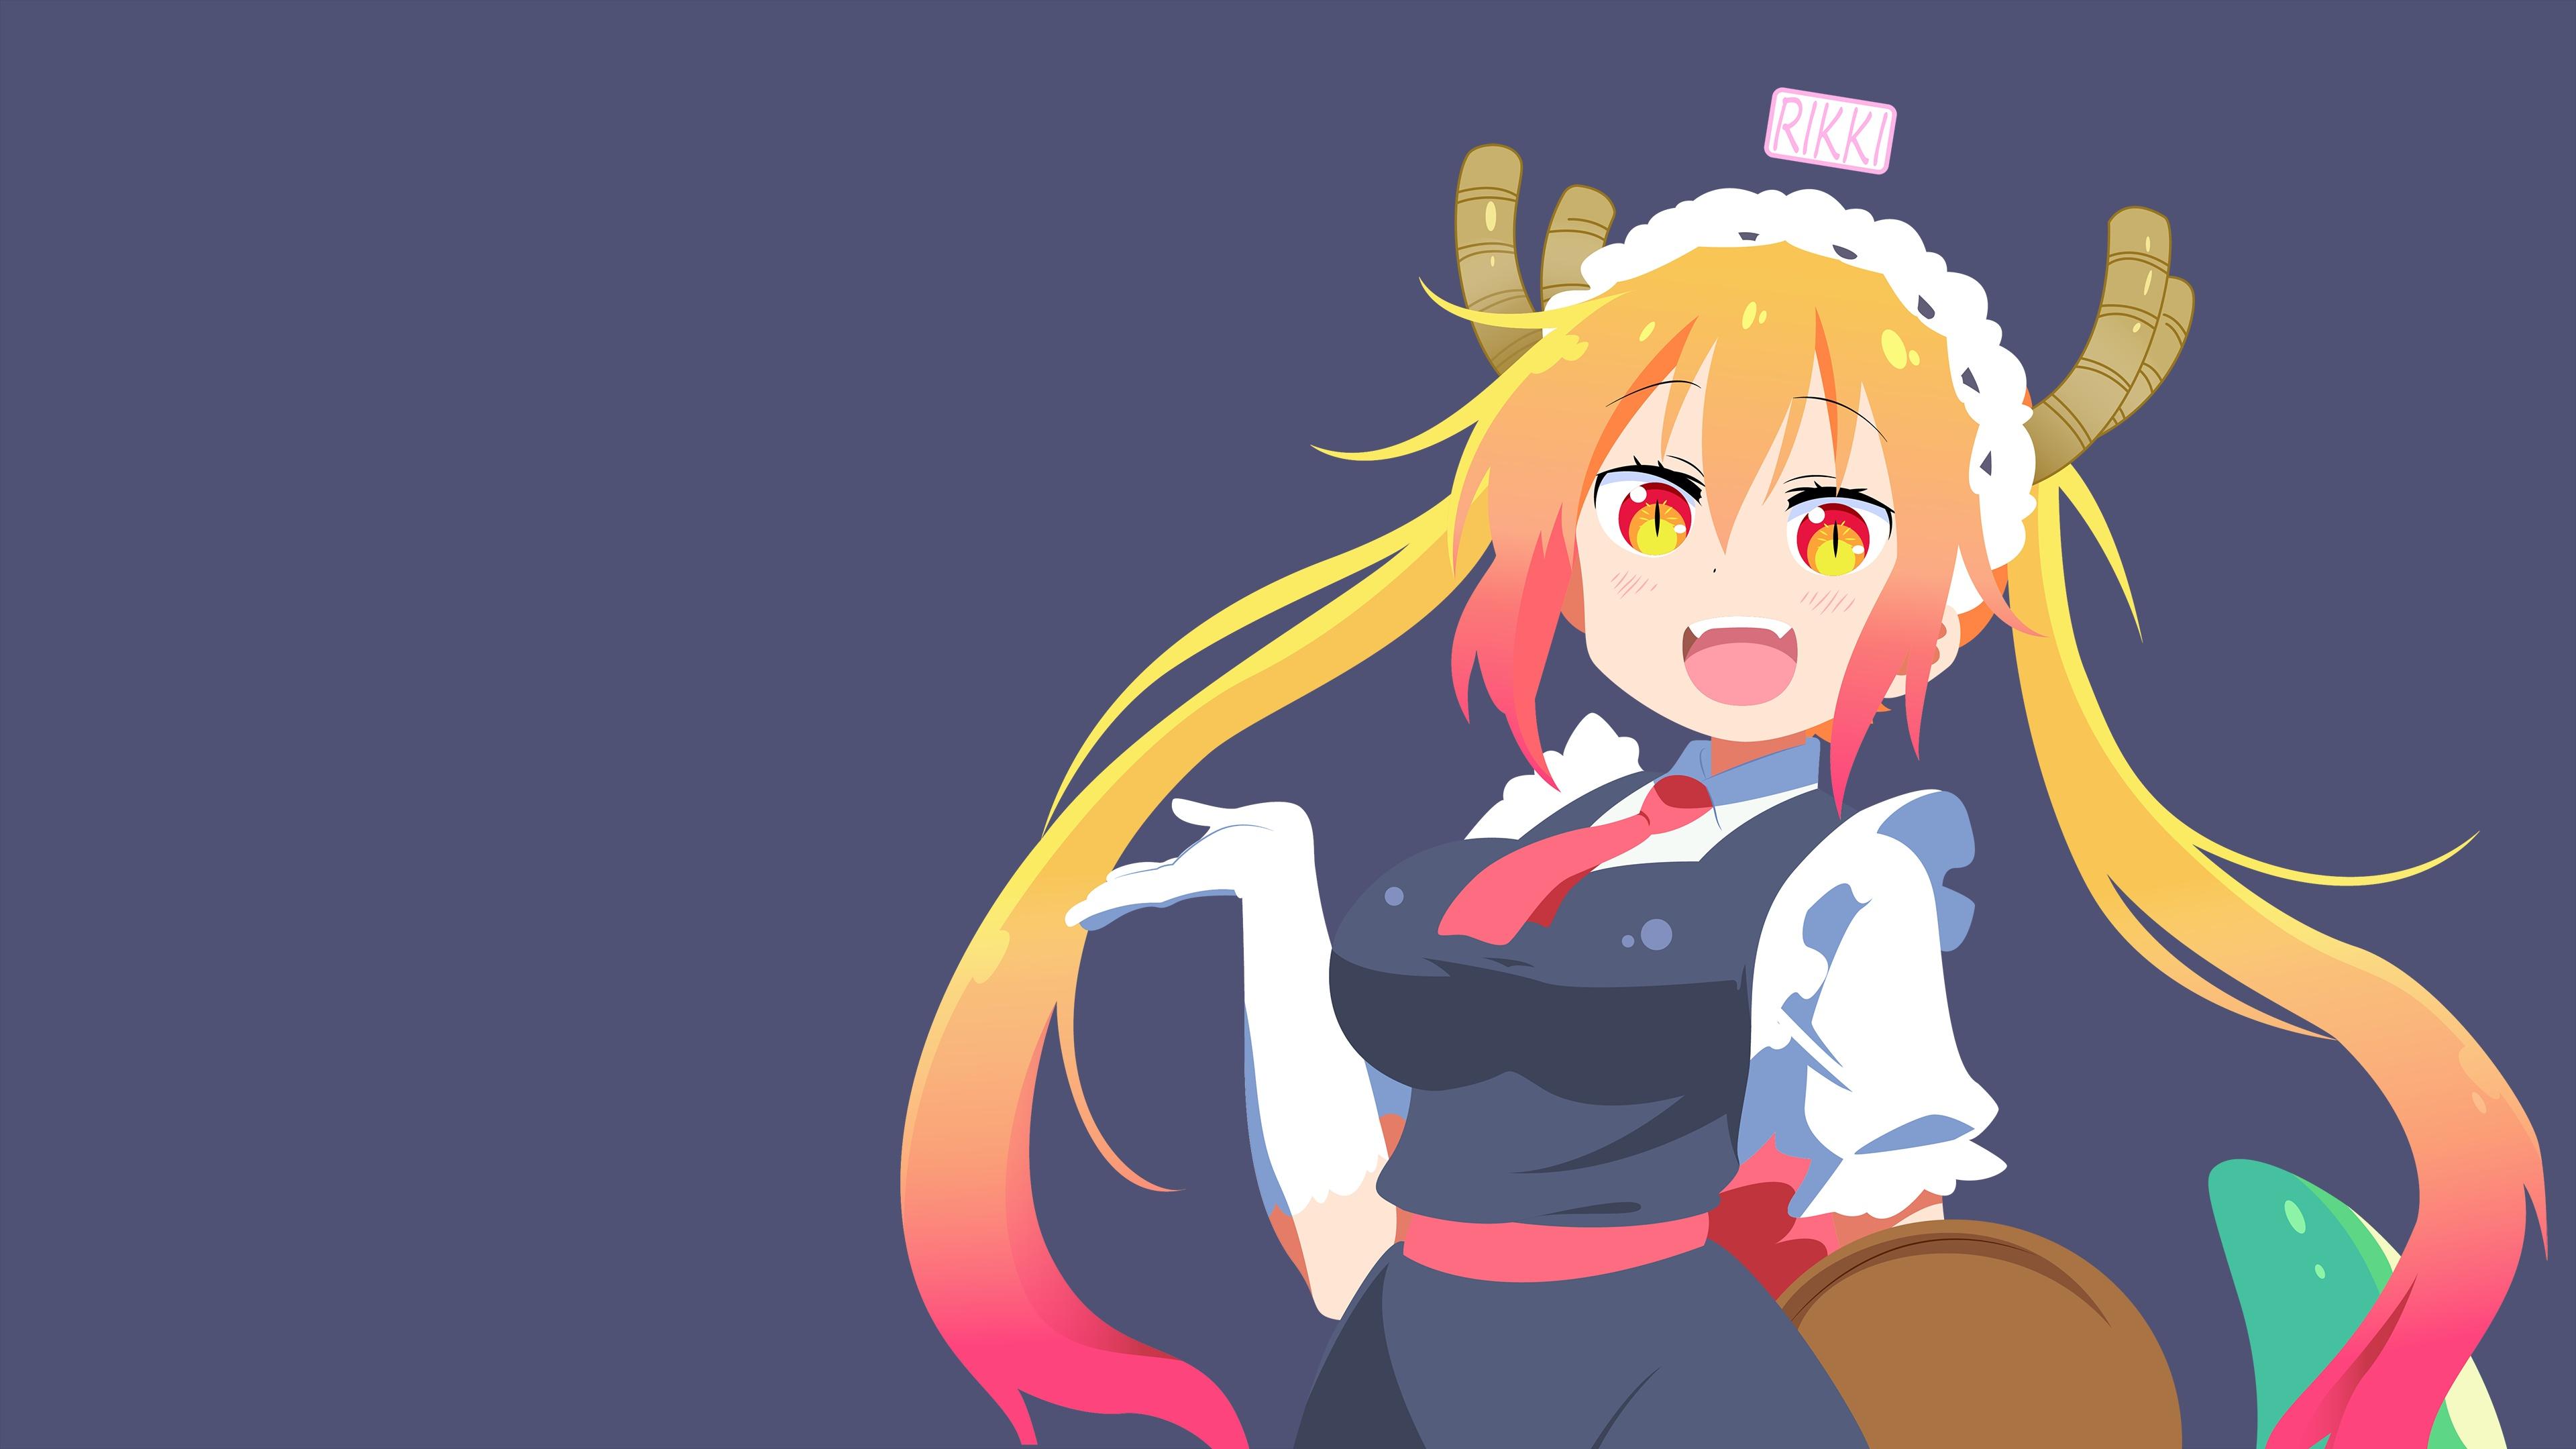 Anime Girl Smile desktop wallpaper free download